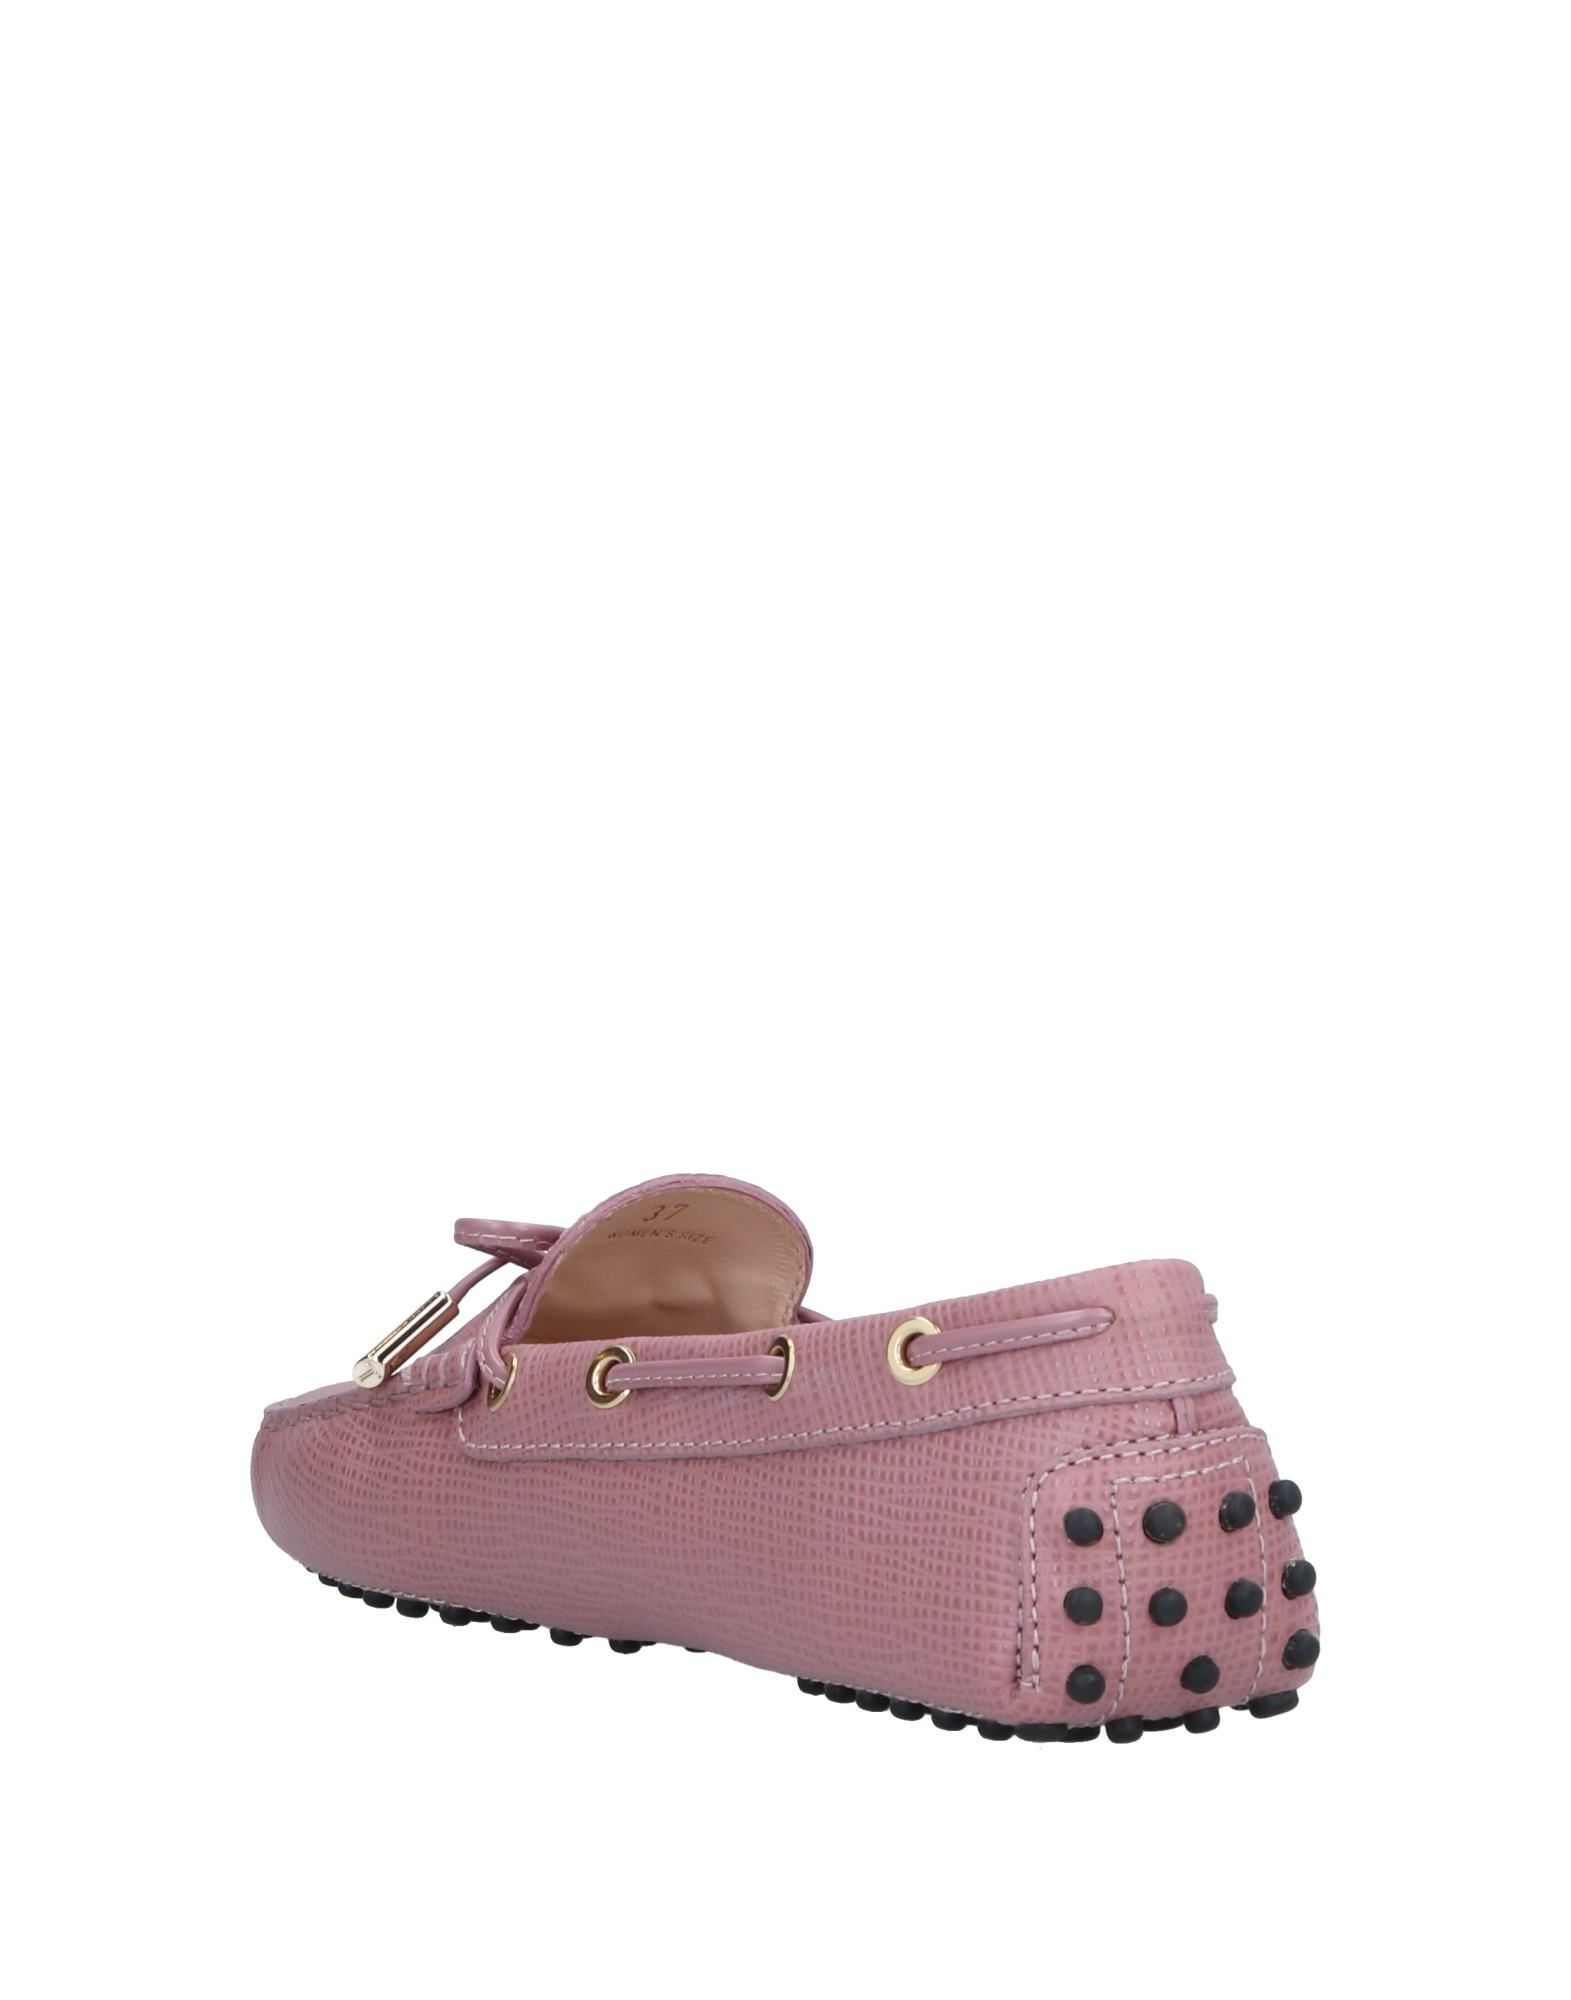 Rabatt Schuhe Tod's Damen Mokassins Damen Tod's  11542516CG 4d46ab